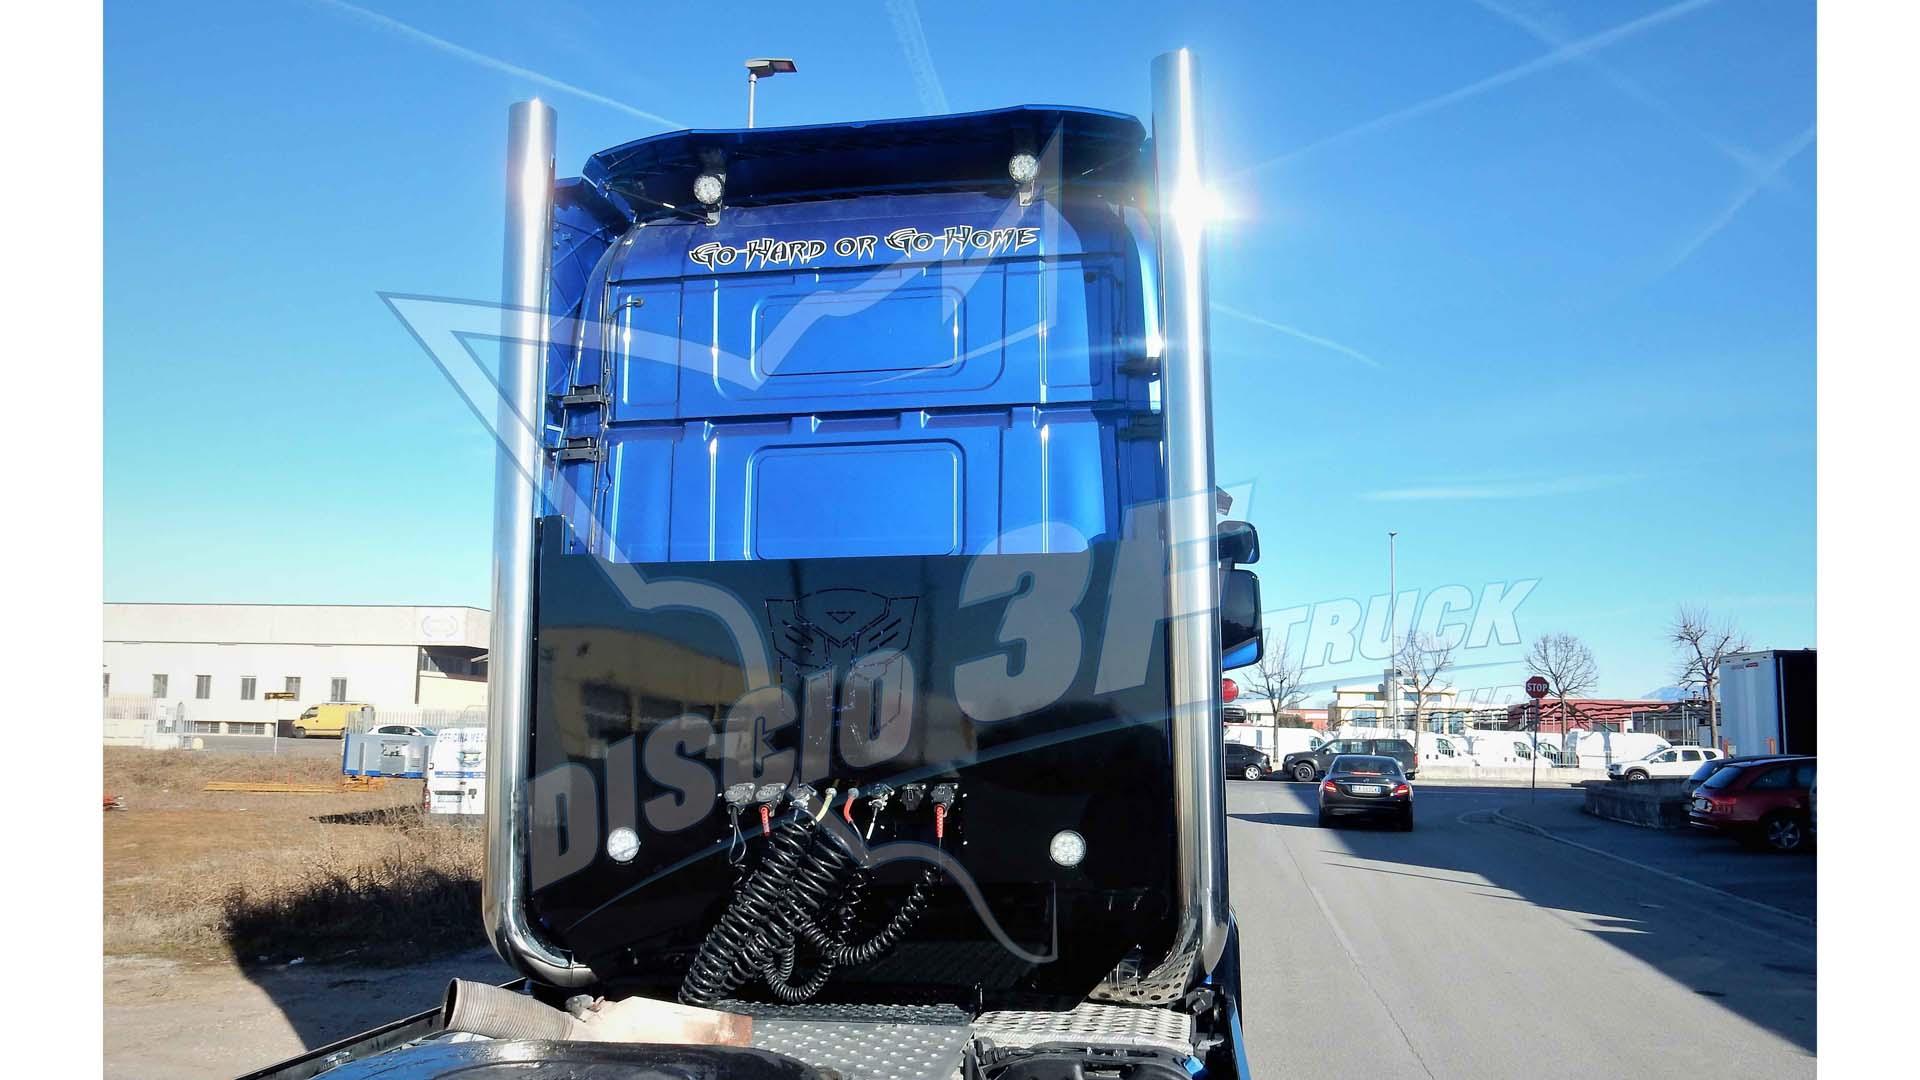 Terminale Verticale Con Telaio, Scania R2/R3